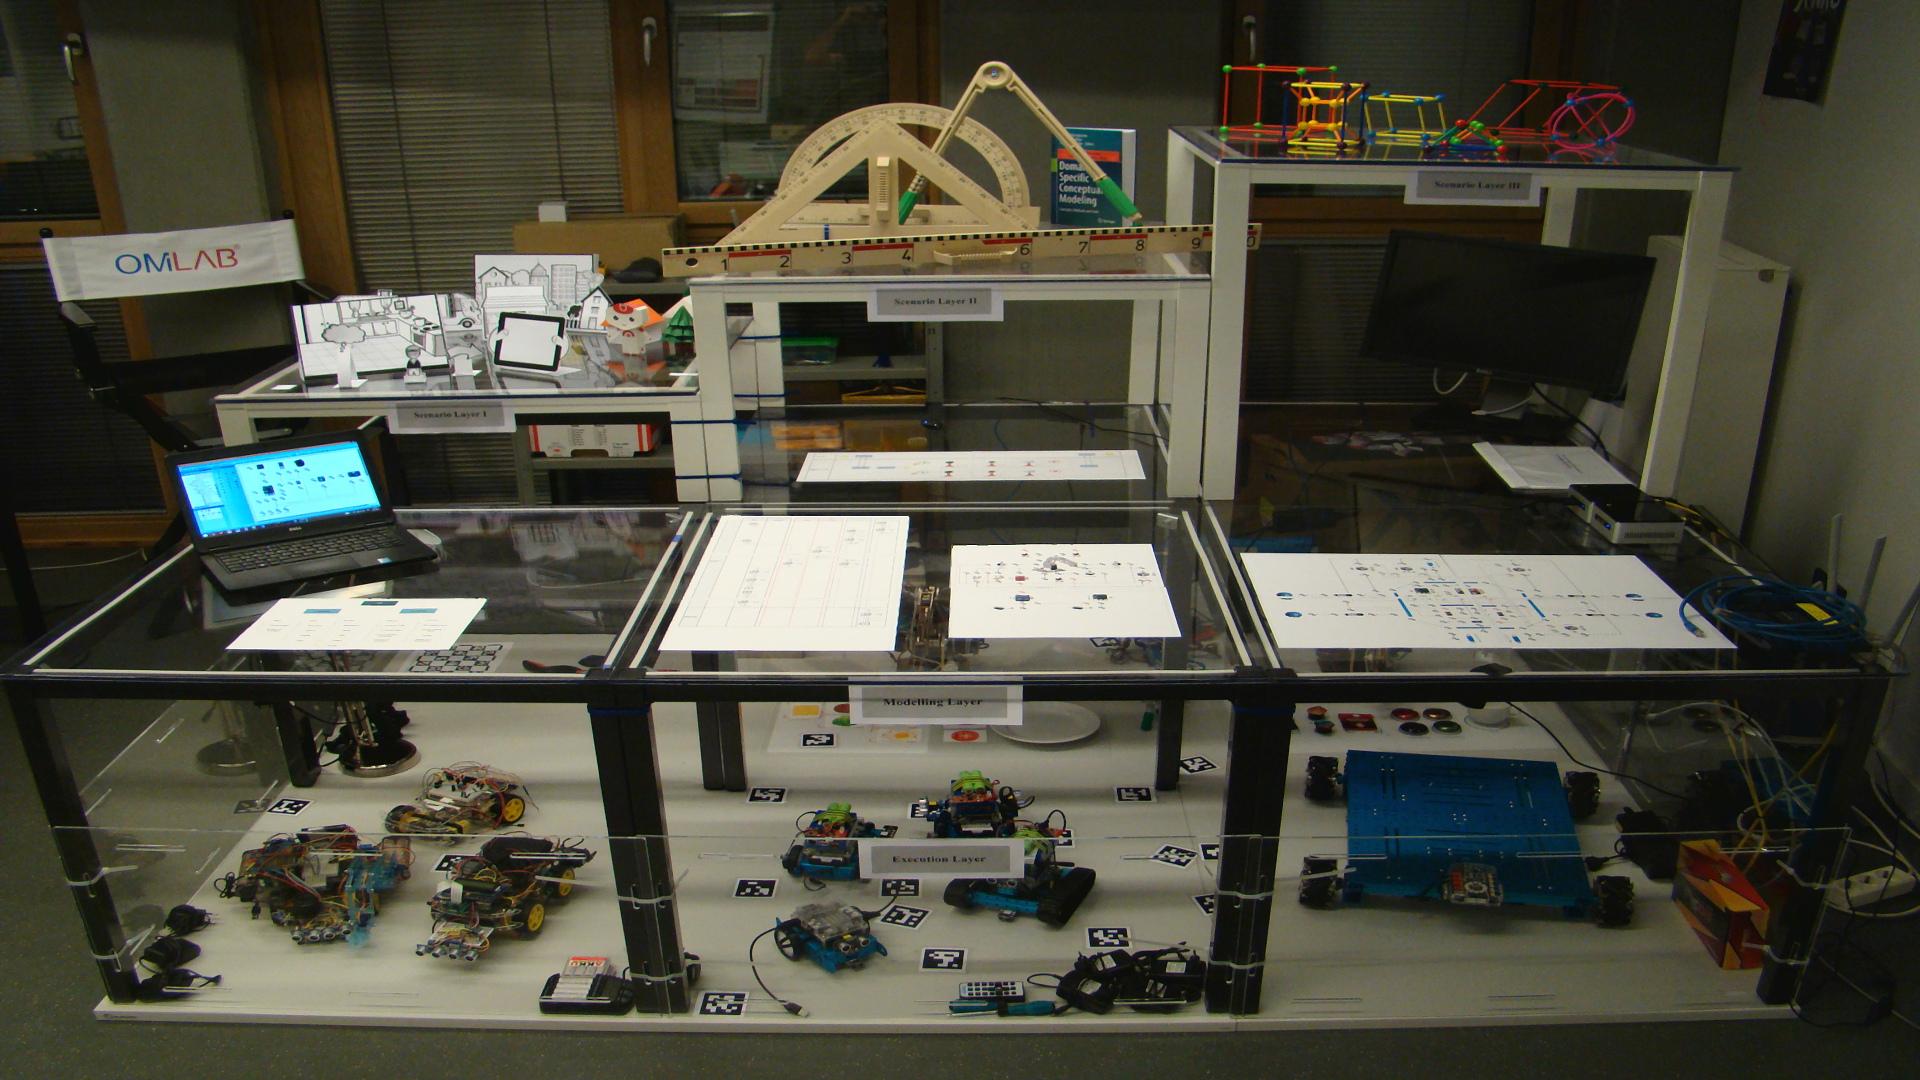 OMiRob Laboratory